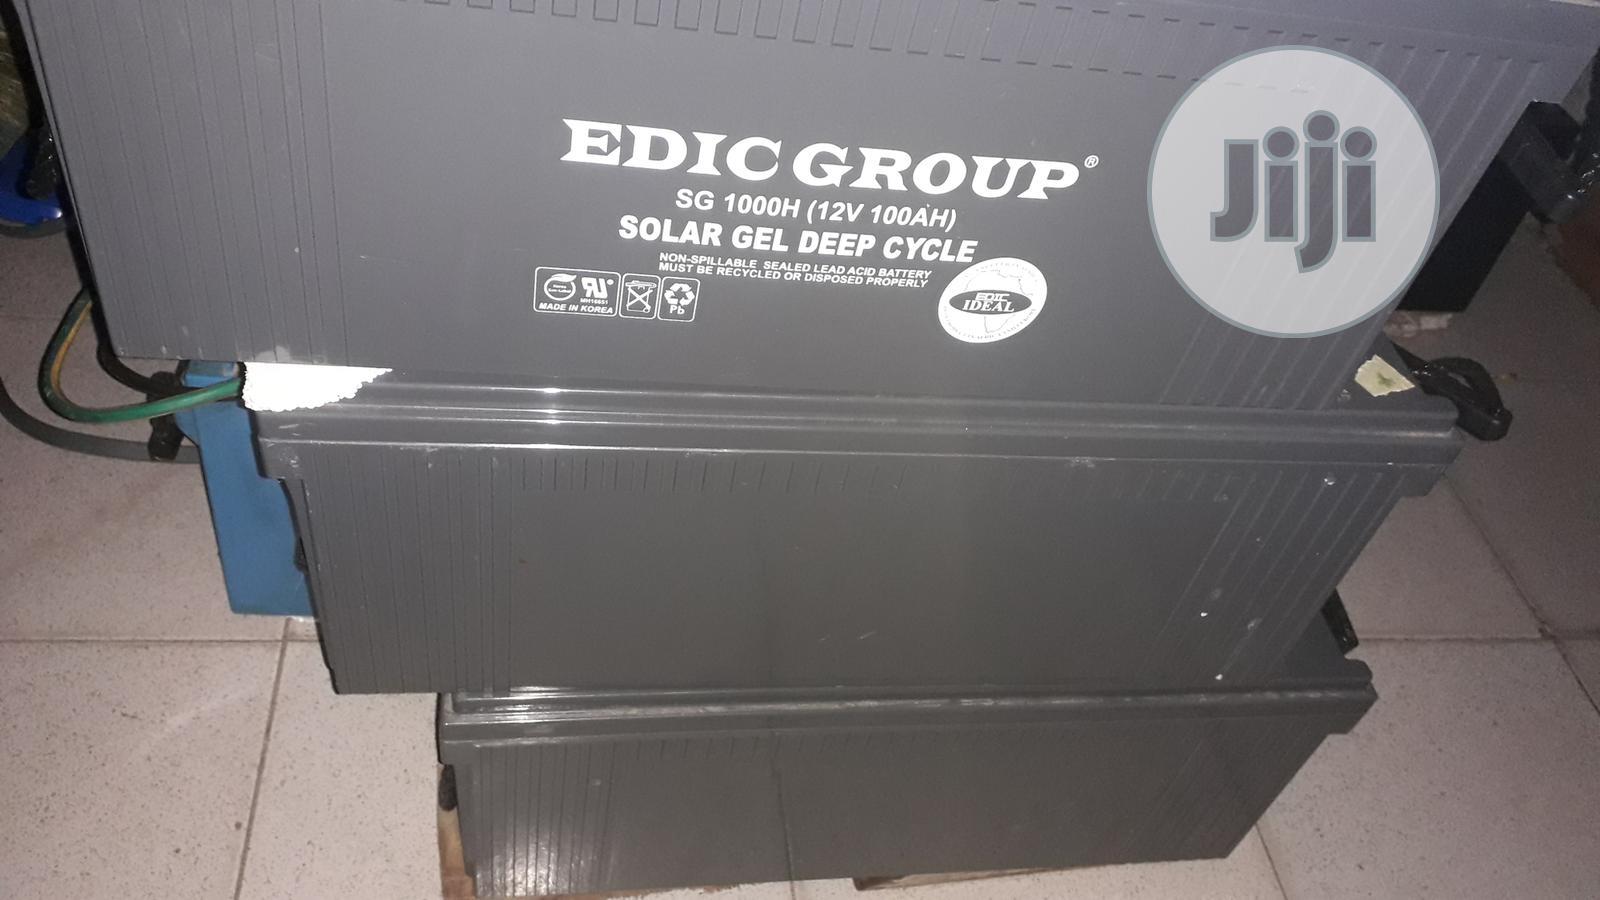 Scrap (Condemn) Solar Batteries Gwagwalada | Building & Trades Services for sale in Gwagwalada, Abuja (FCT) State, Nigeria